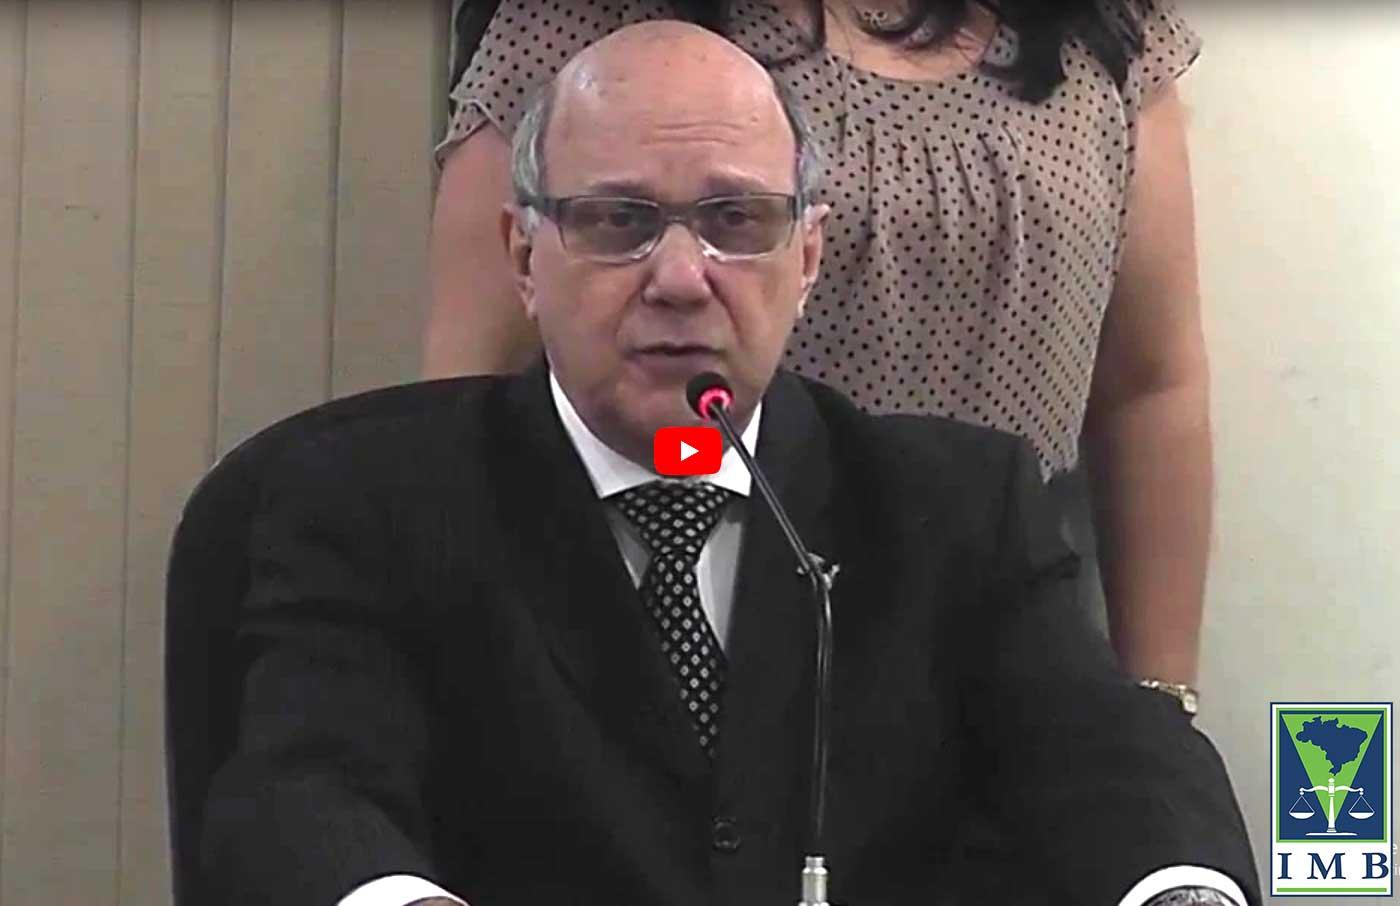 Tema: Diálogo sobre o novo CPC - Palestra ao vivo do dia 23 de Junho de 2015